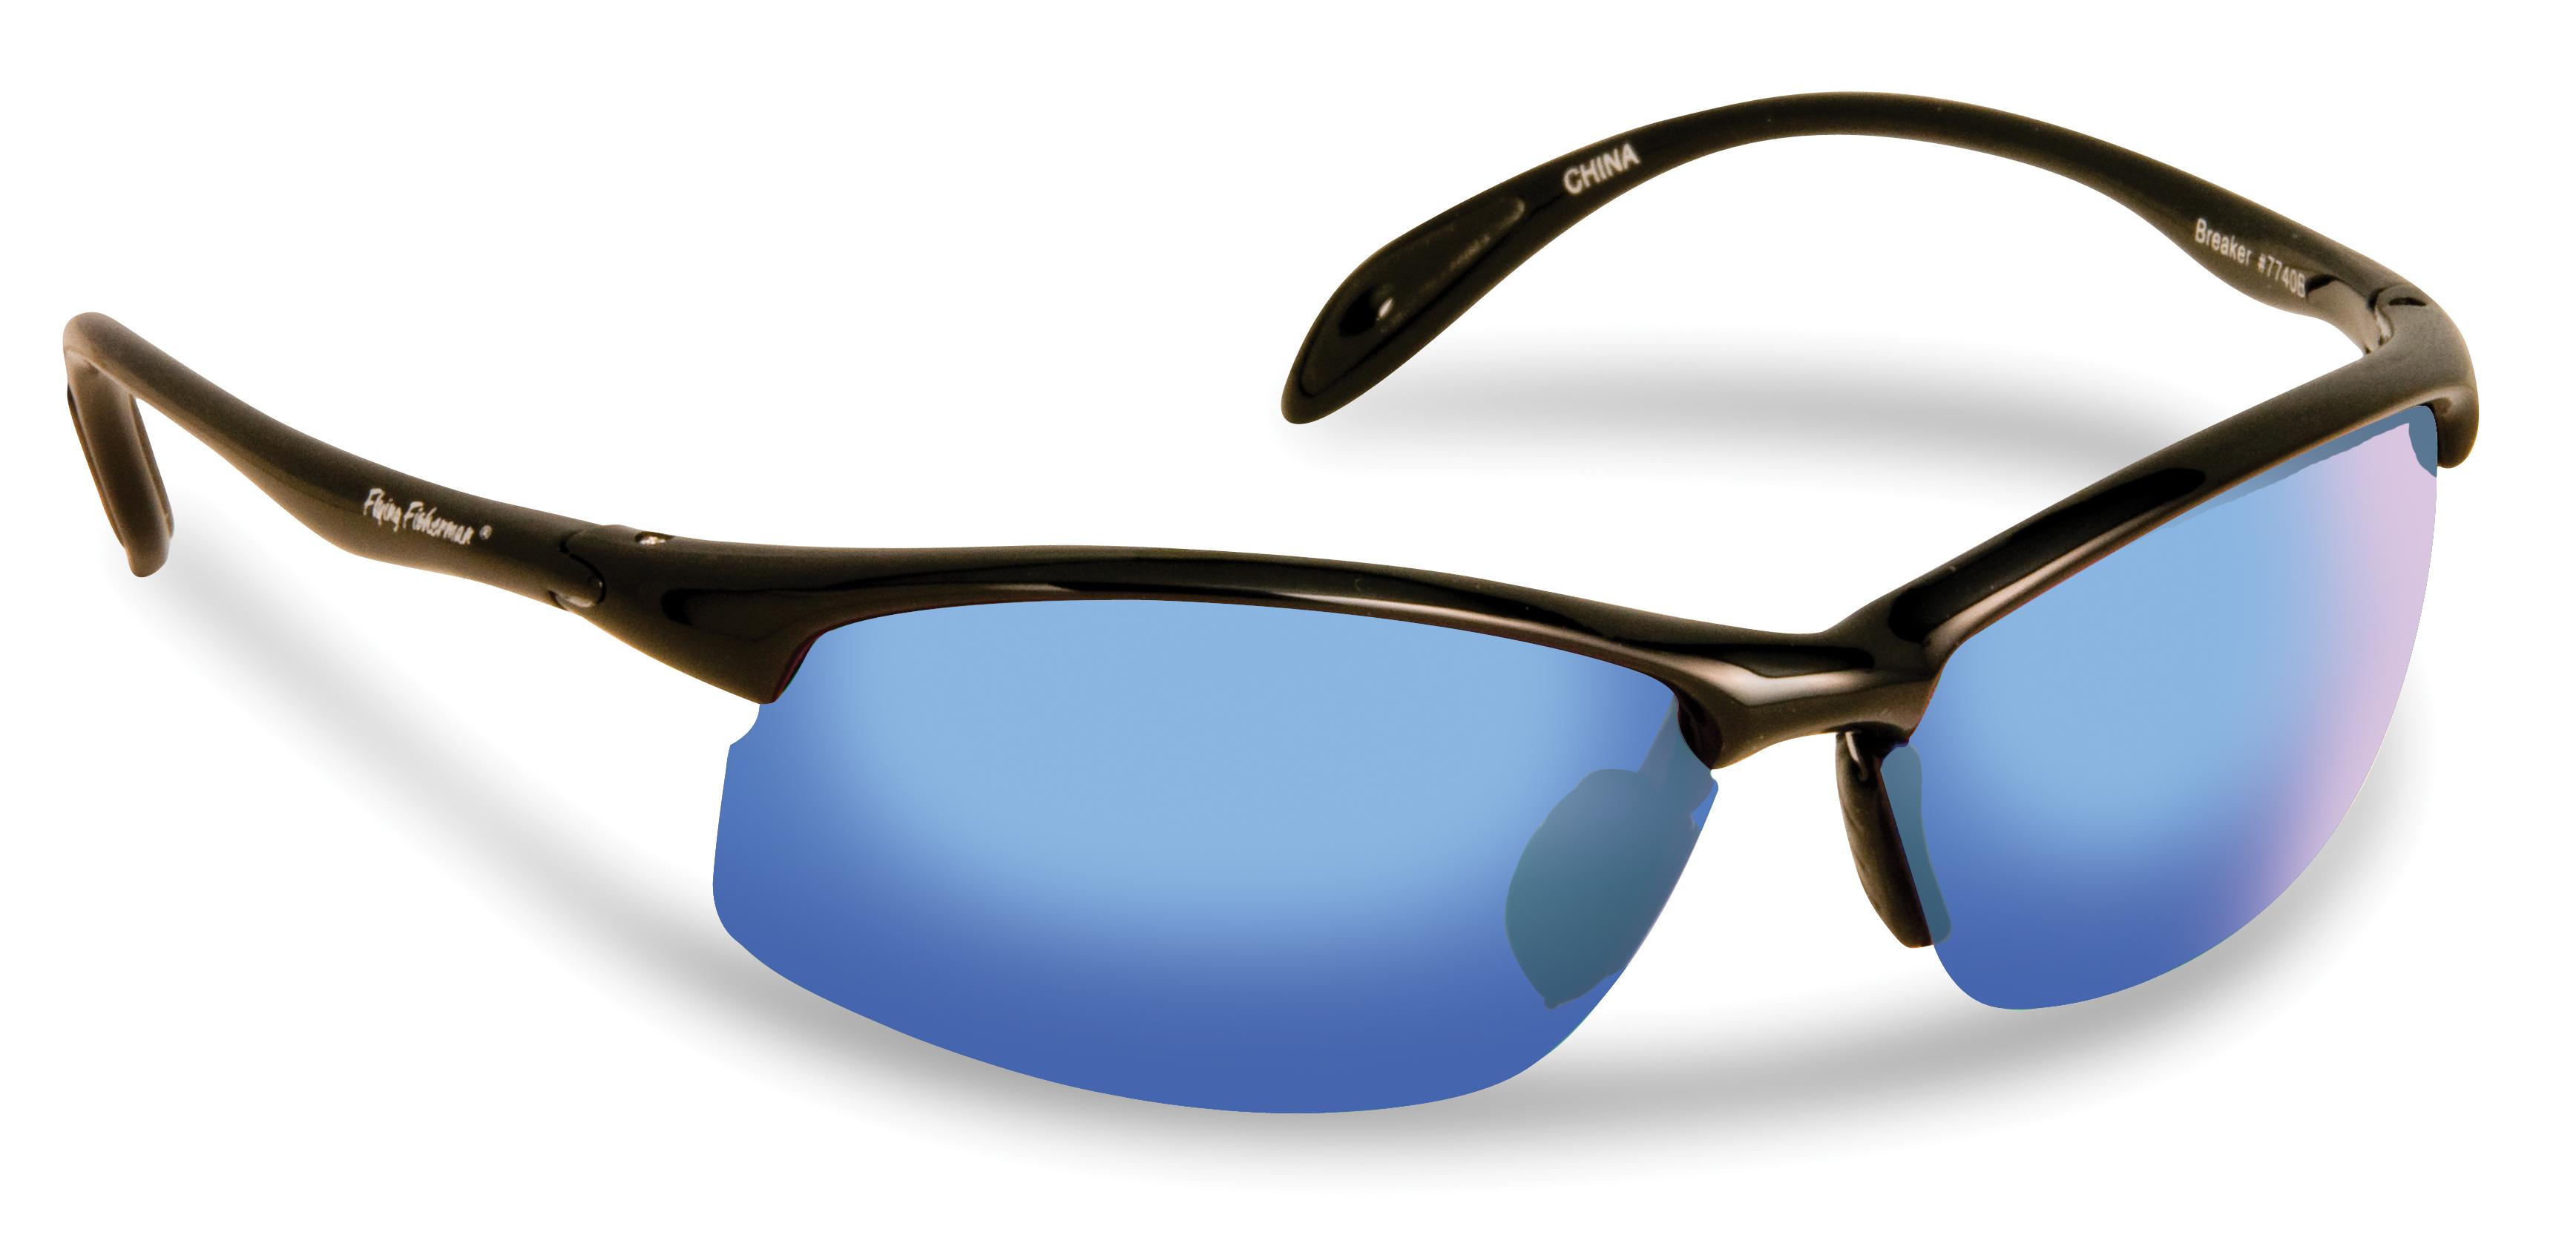 98a68adea4 Polarized Carp Fly Sea Fishing Sunglasses « Heritage Malta